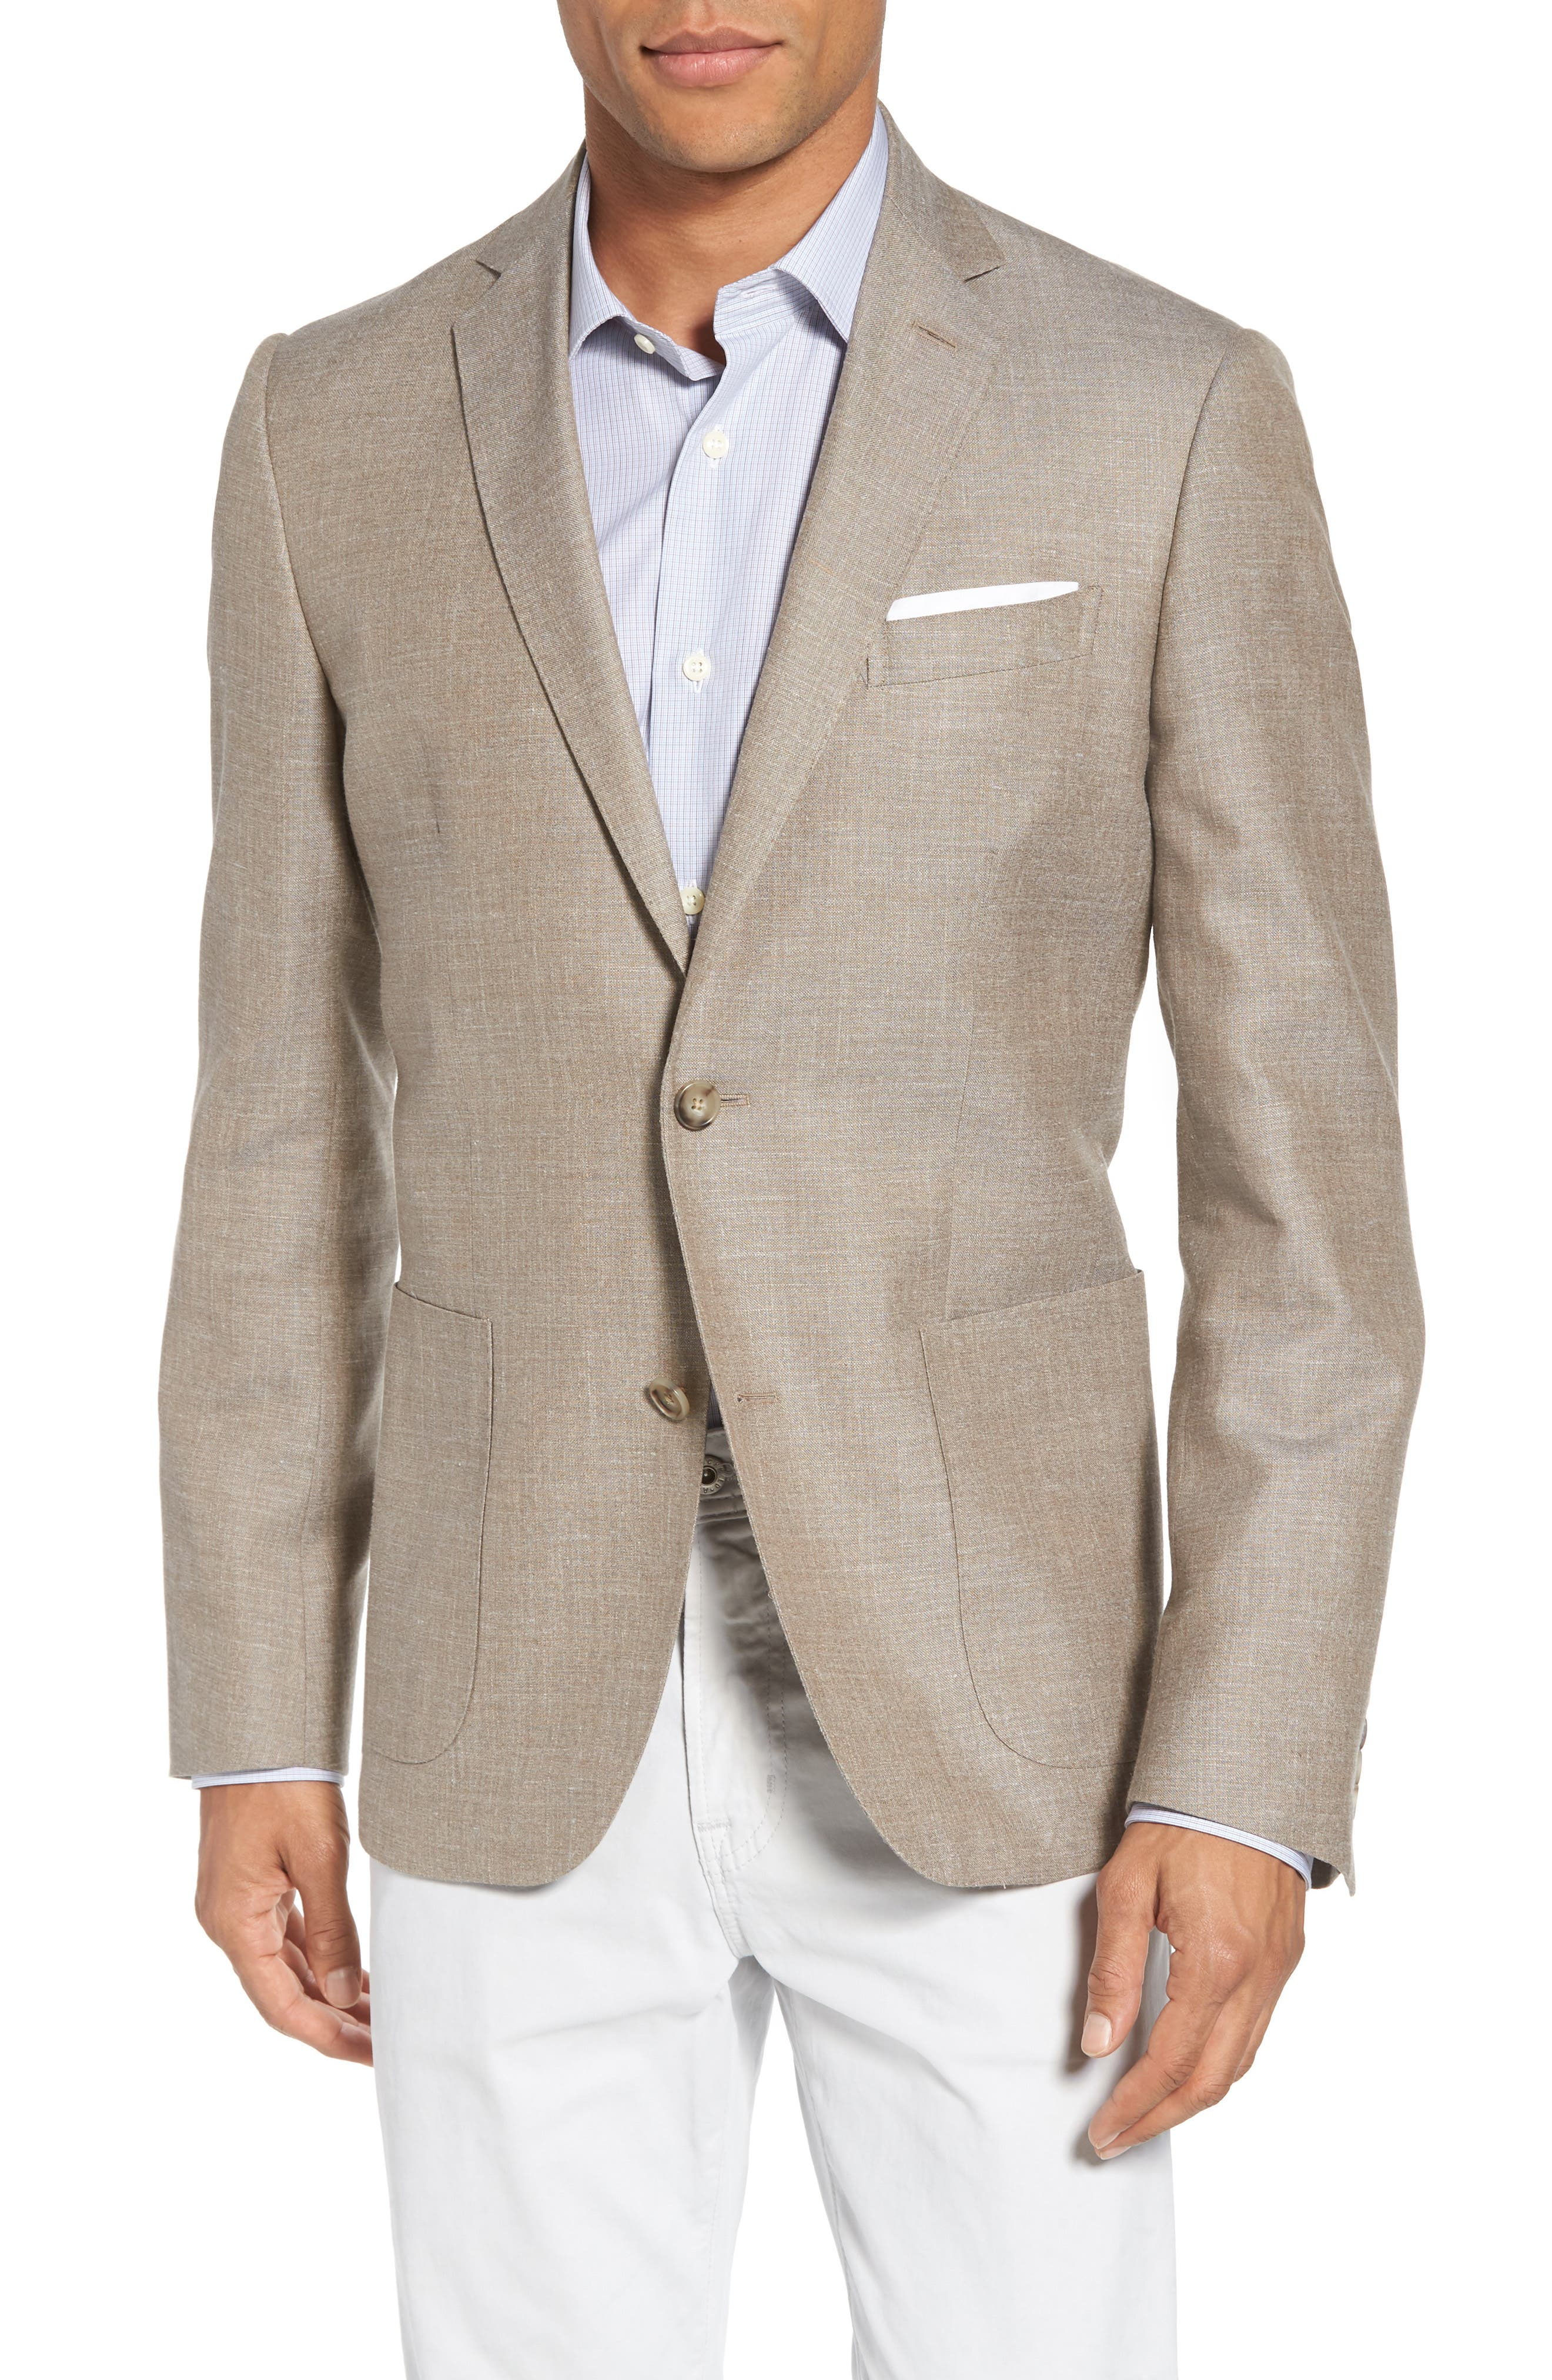 Trim Fit Wool Blend Blazer,                             Main thumbnail 1, color,                             Tan